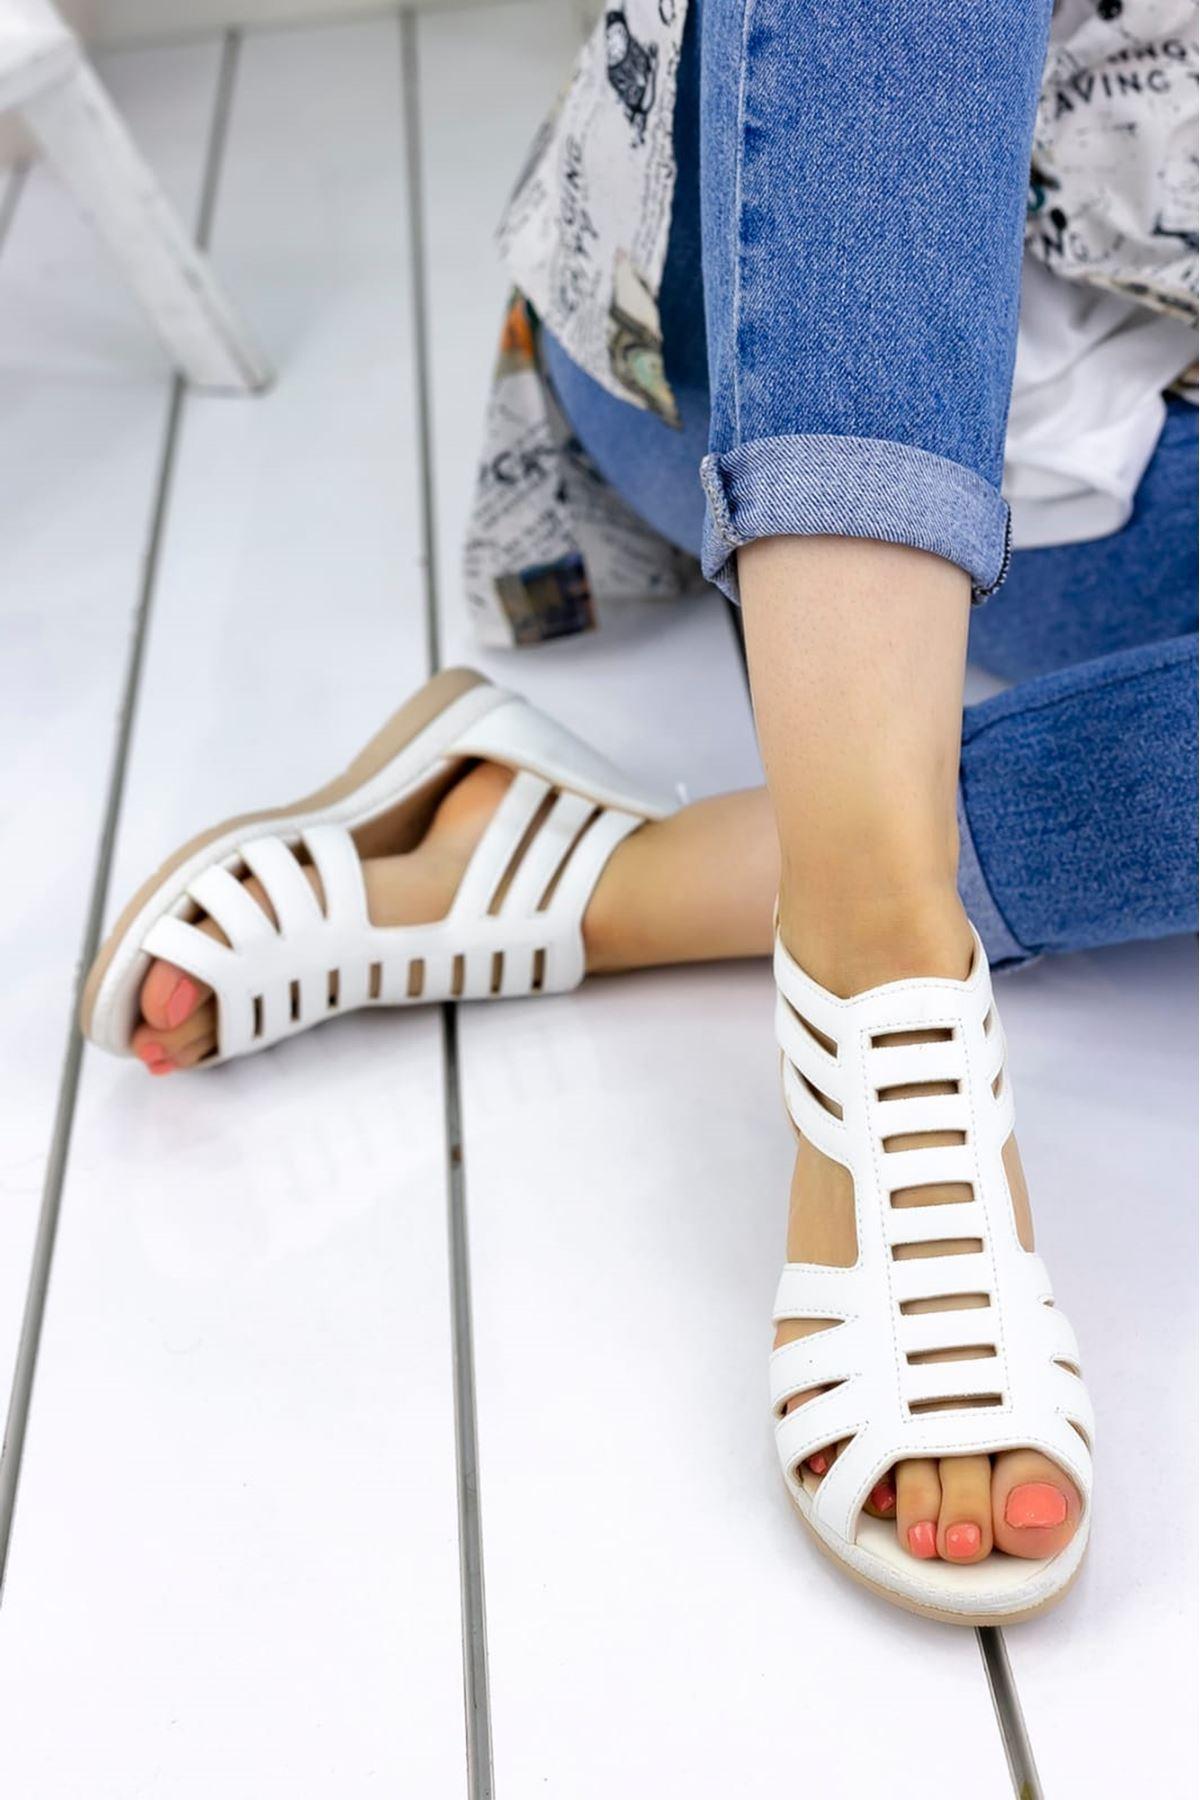 Shiro Mat Deri Sandalet Beyaz